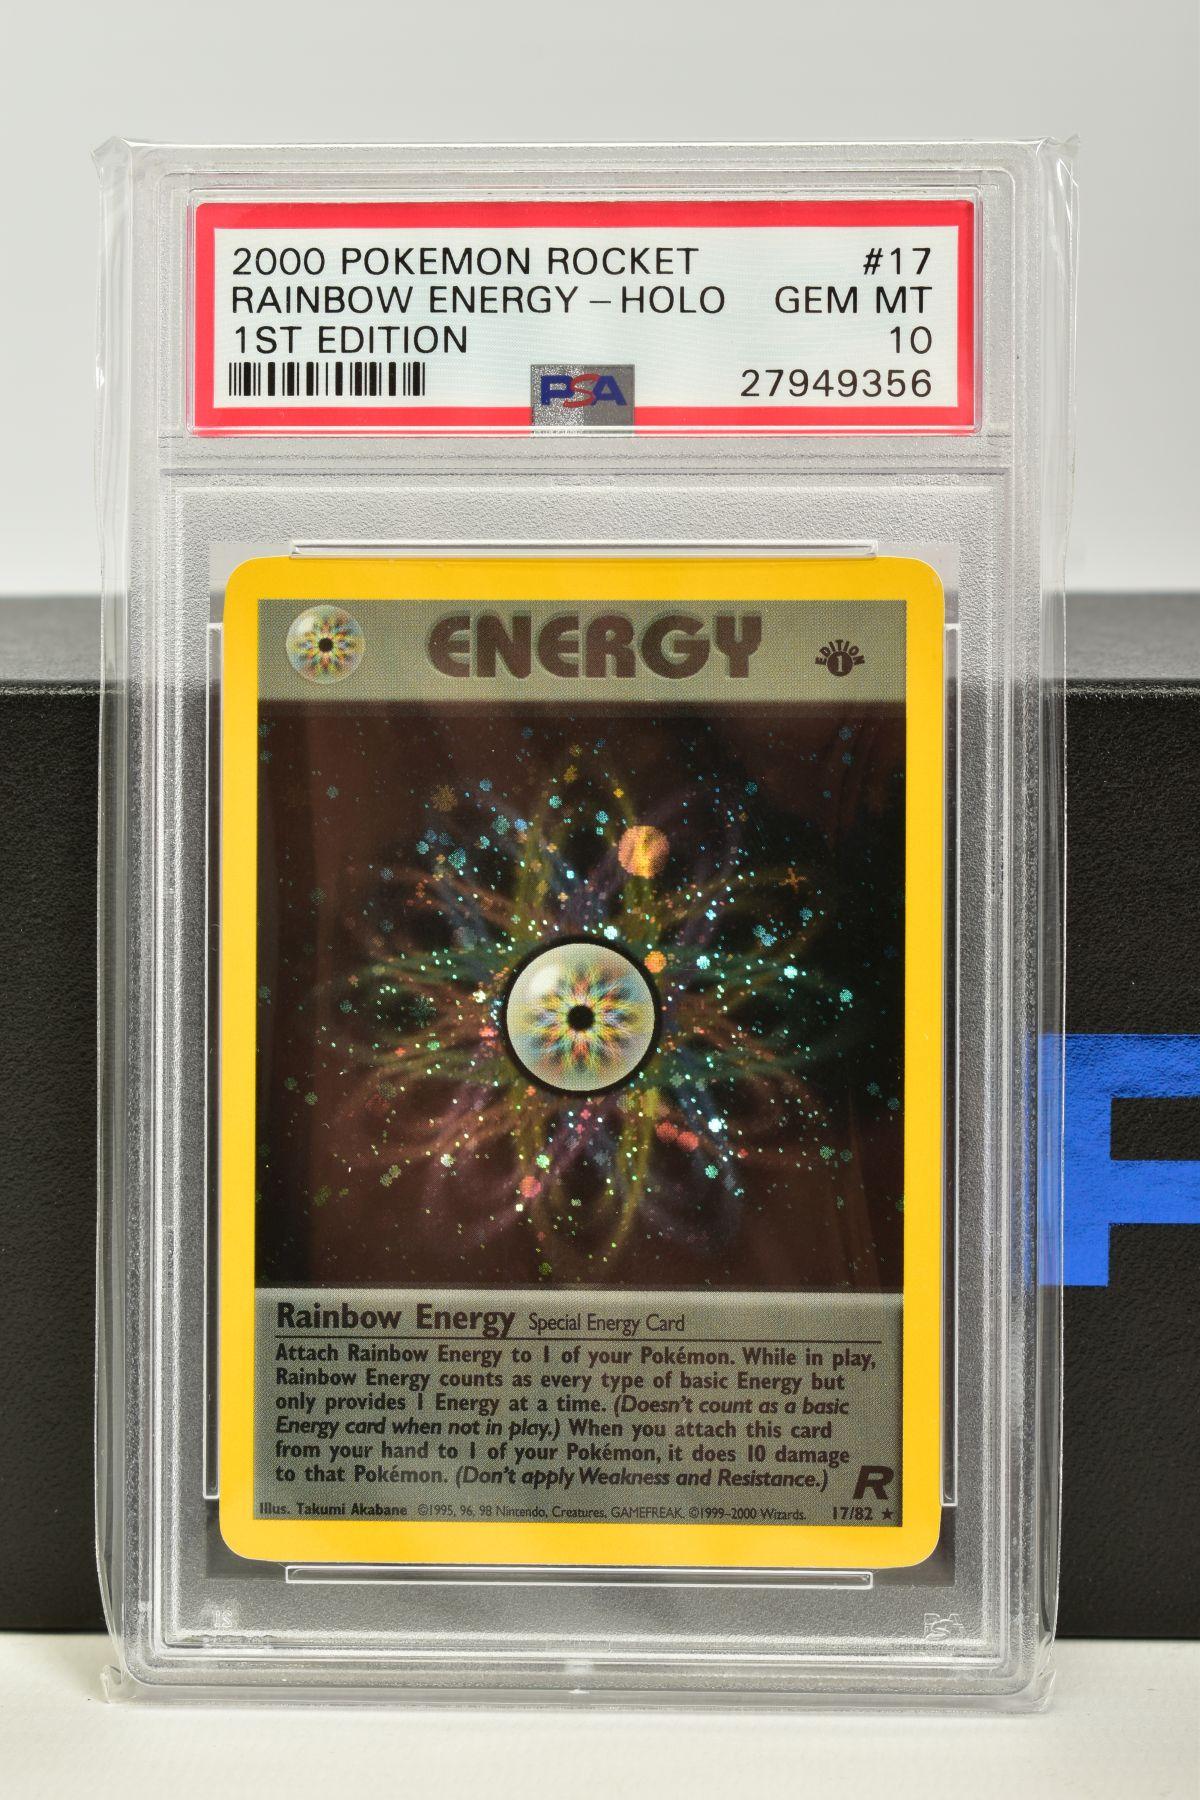 A PSA GRADED POKEMON 1ST EDITION TEAM ROCKET SET RAINBOW ENERGY HOLO CARD, (17/82), graded GEM